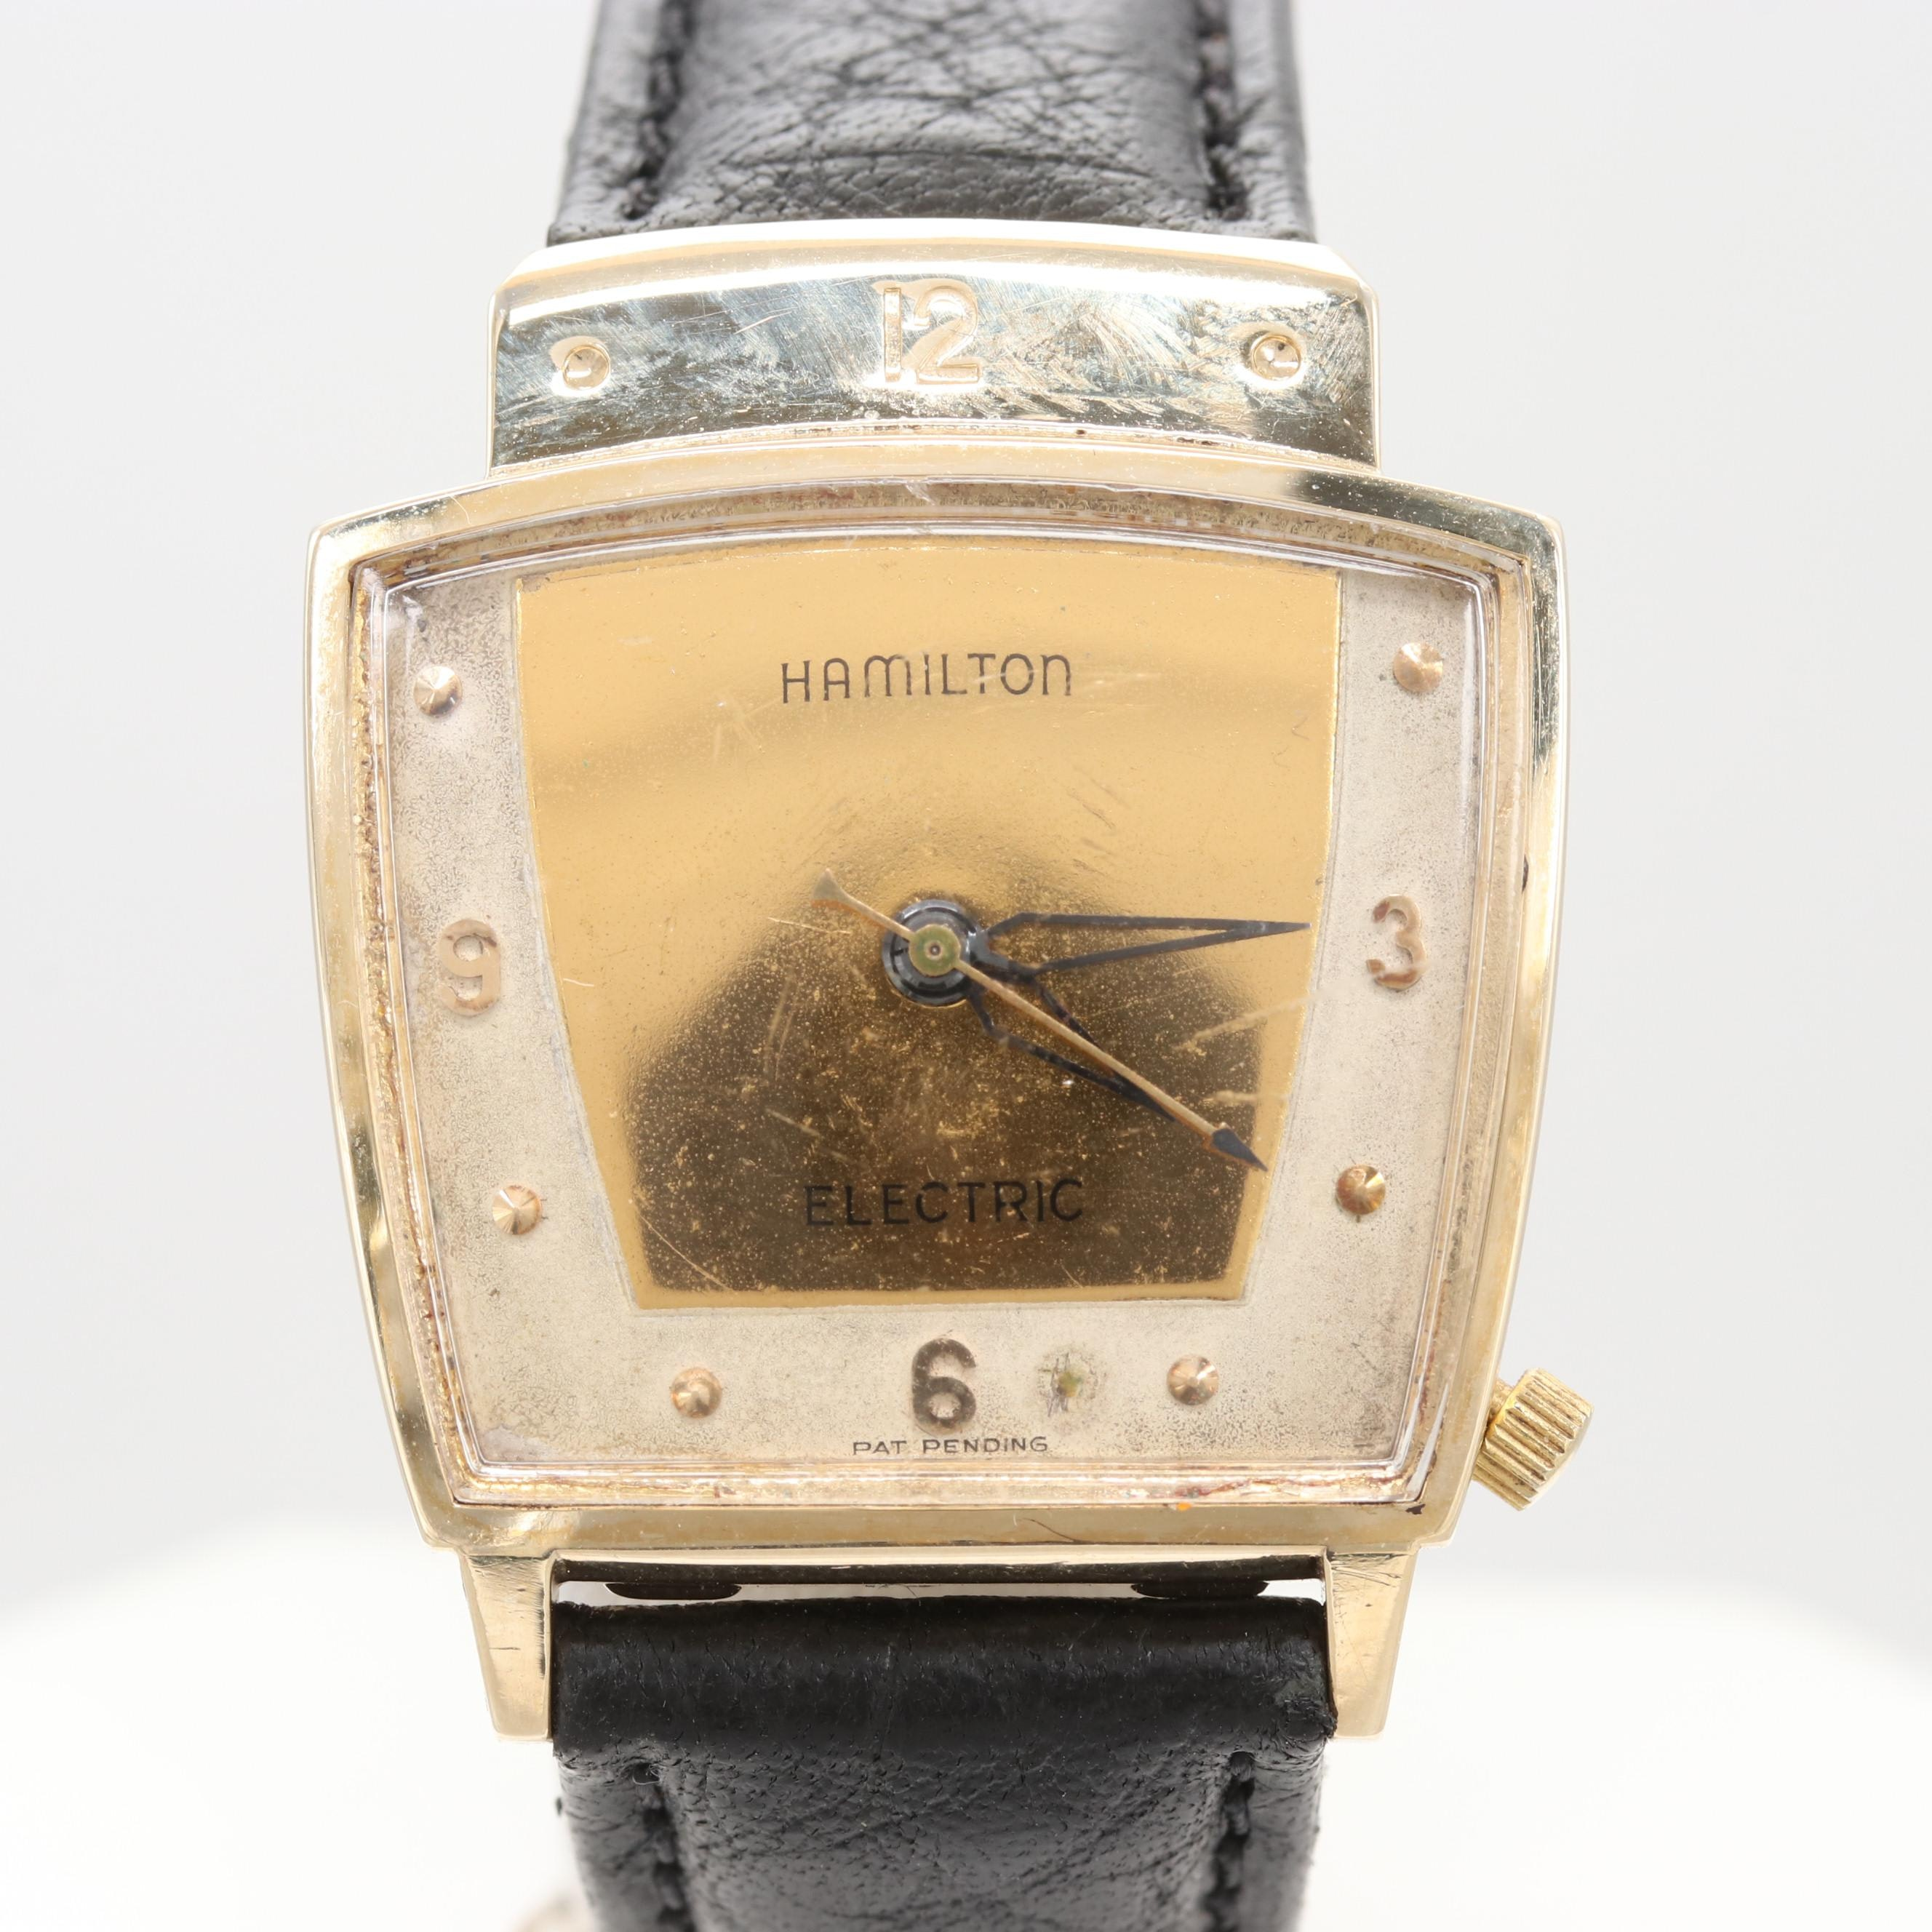 Circa 1957 Hamilton 10K Gold Filled Everest Electric Wristwatch